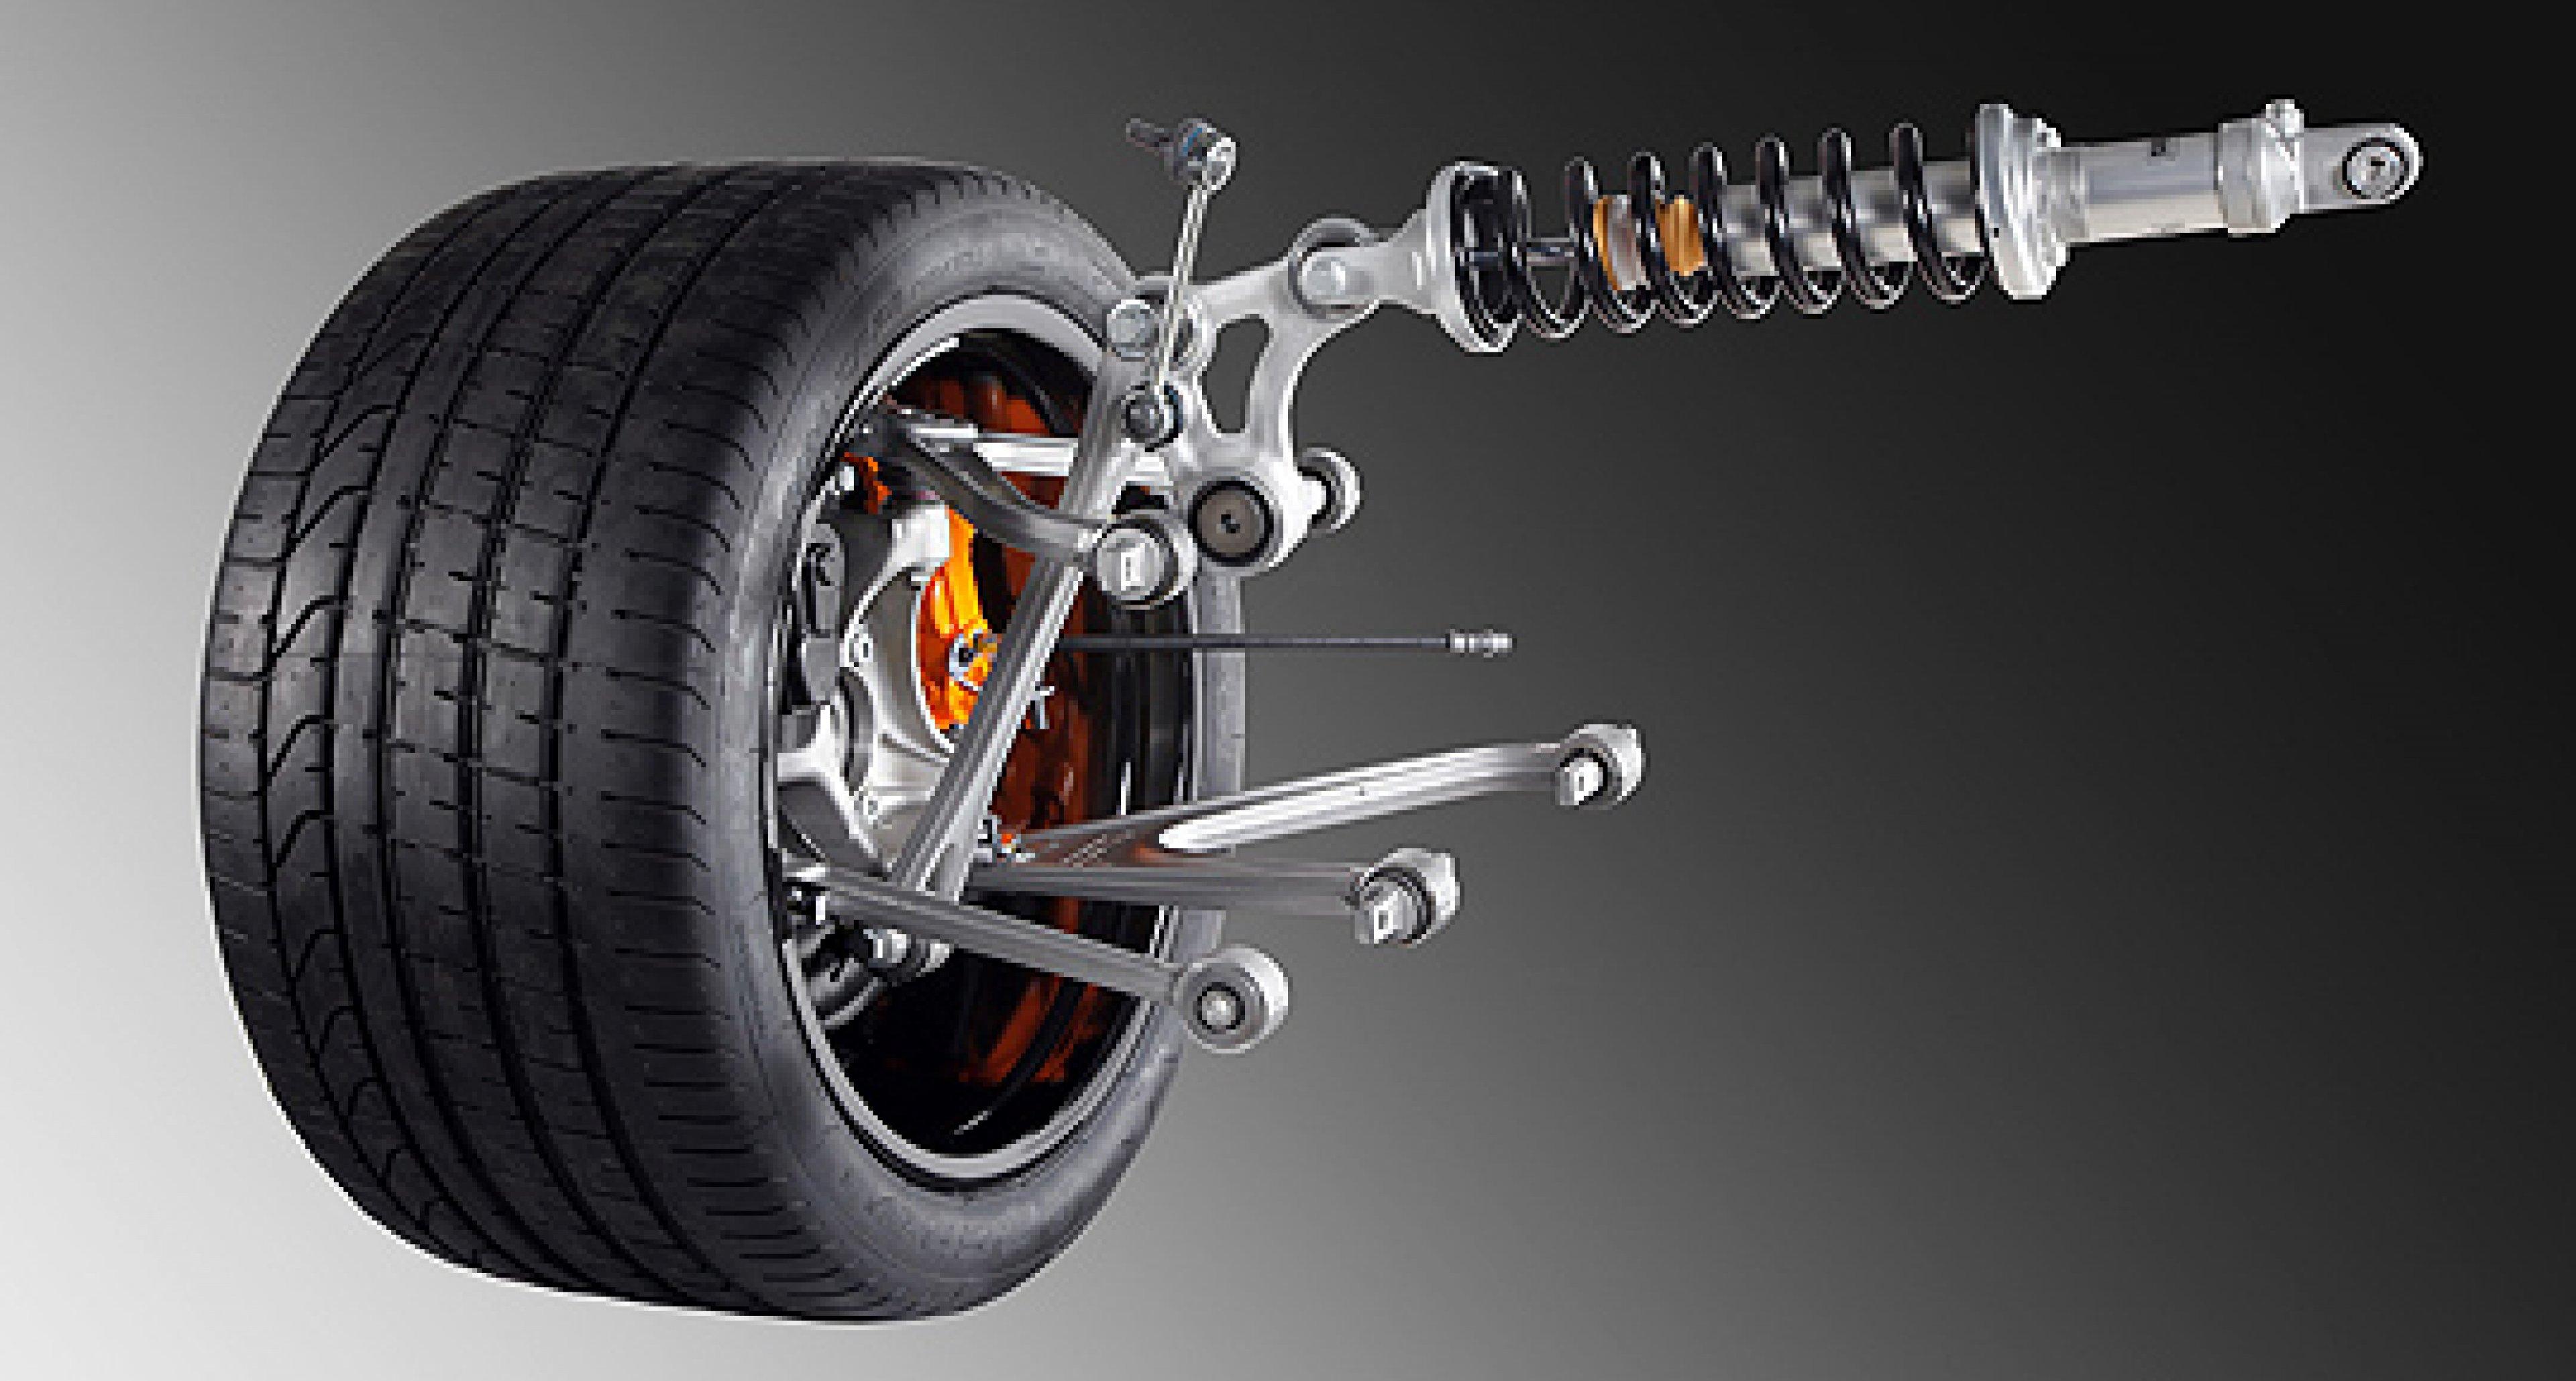 Neuer Lamborghini kommt mit Pushrod-Aufhängung